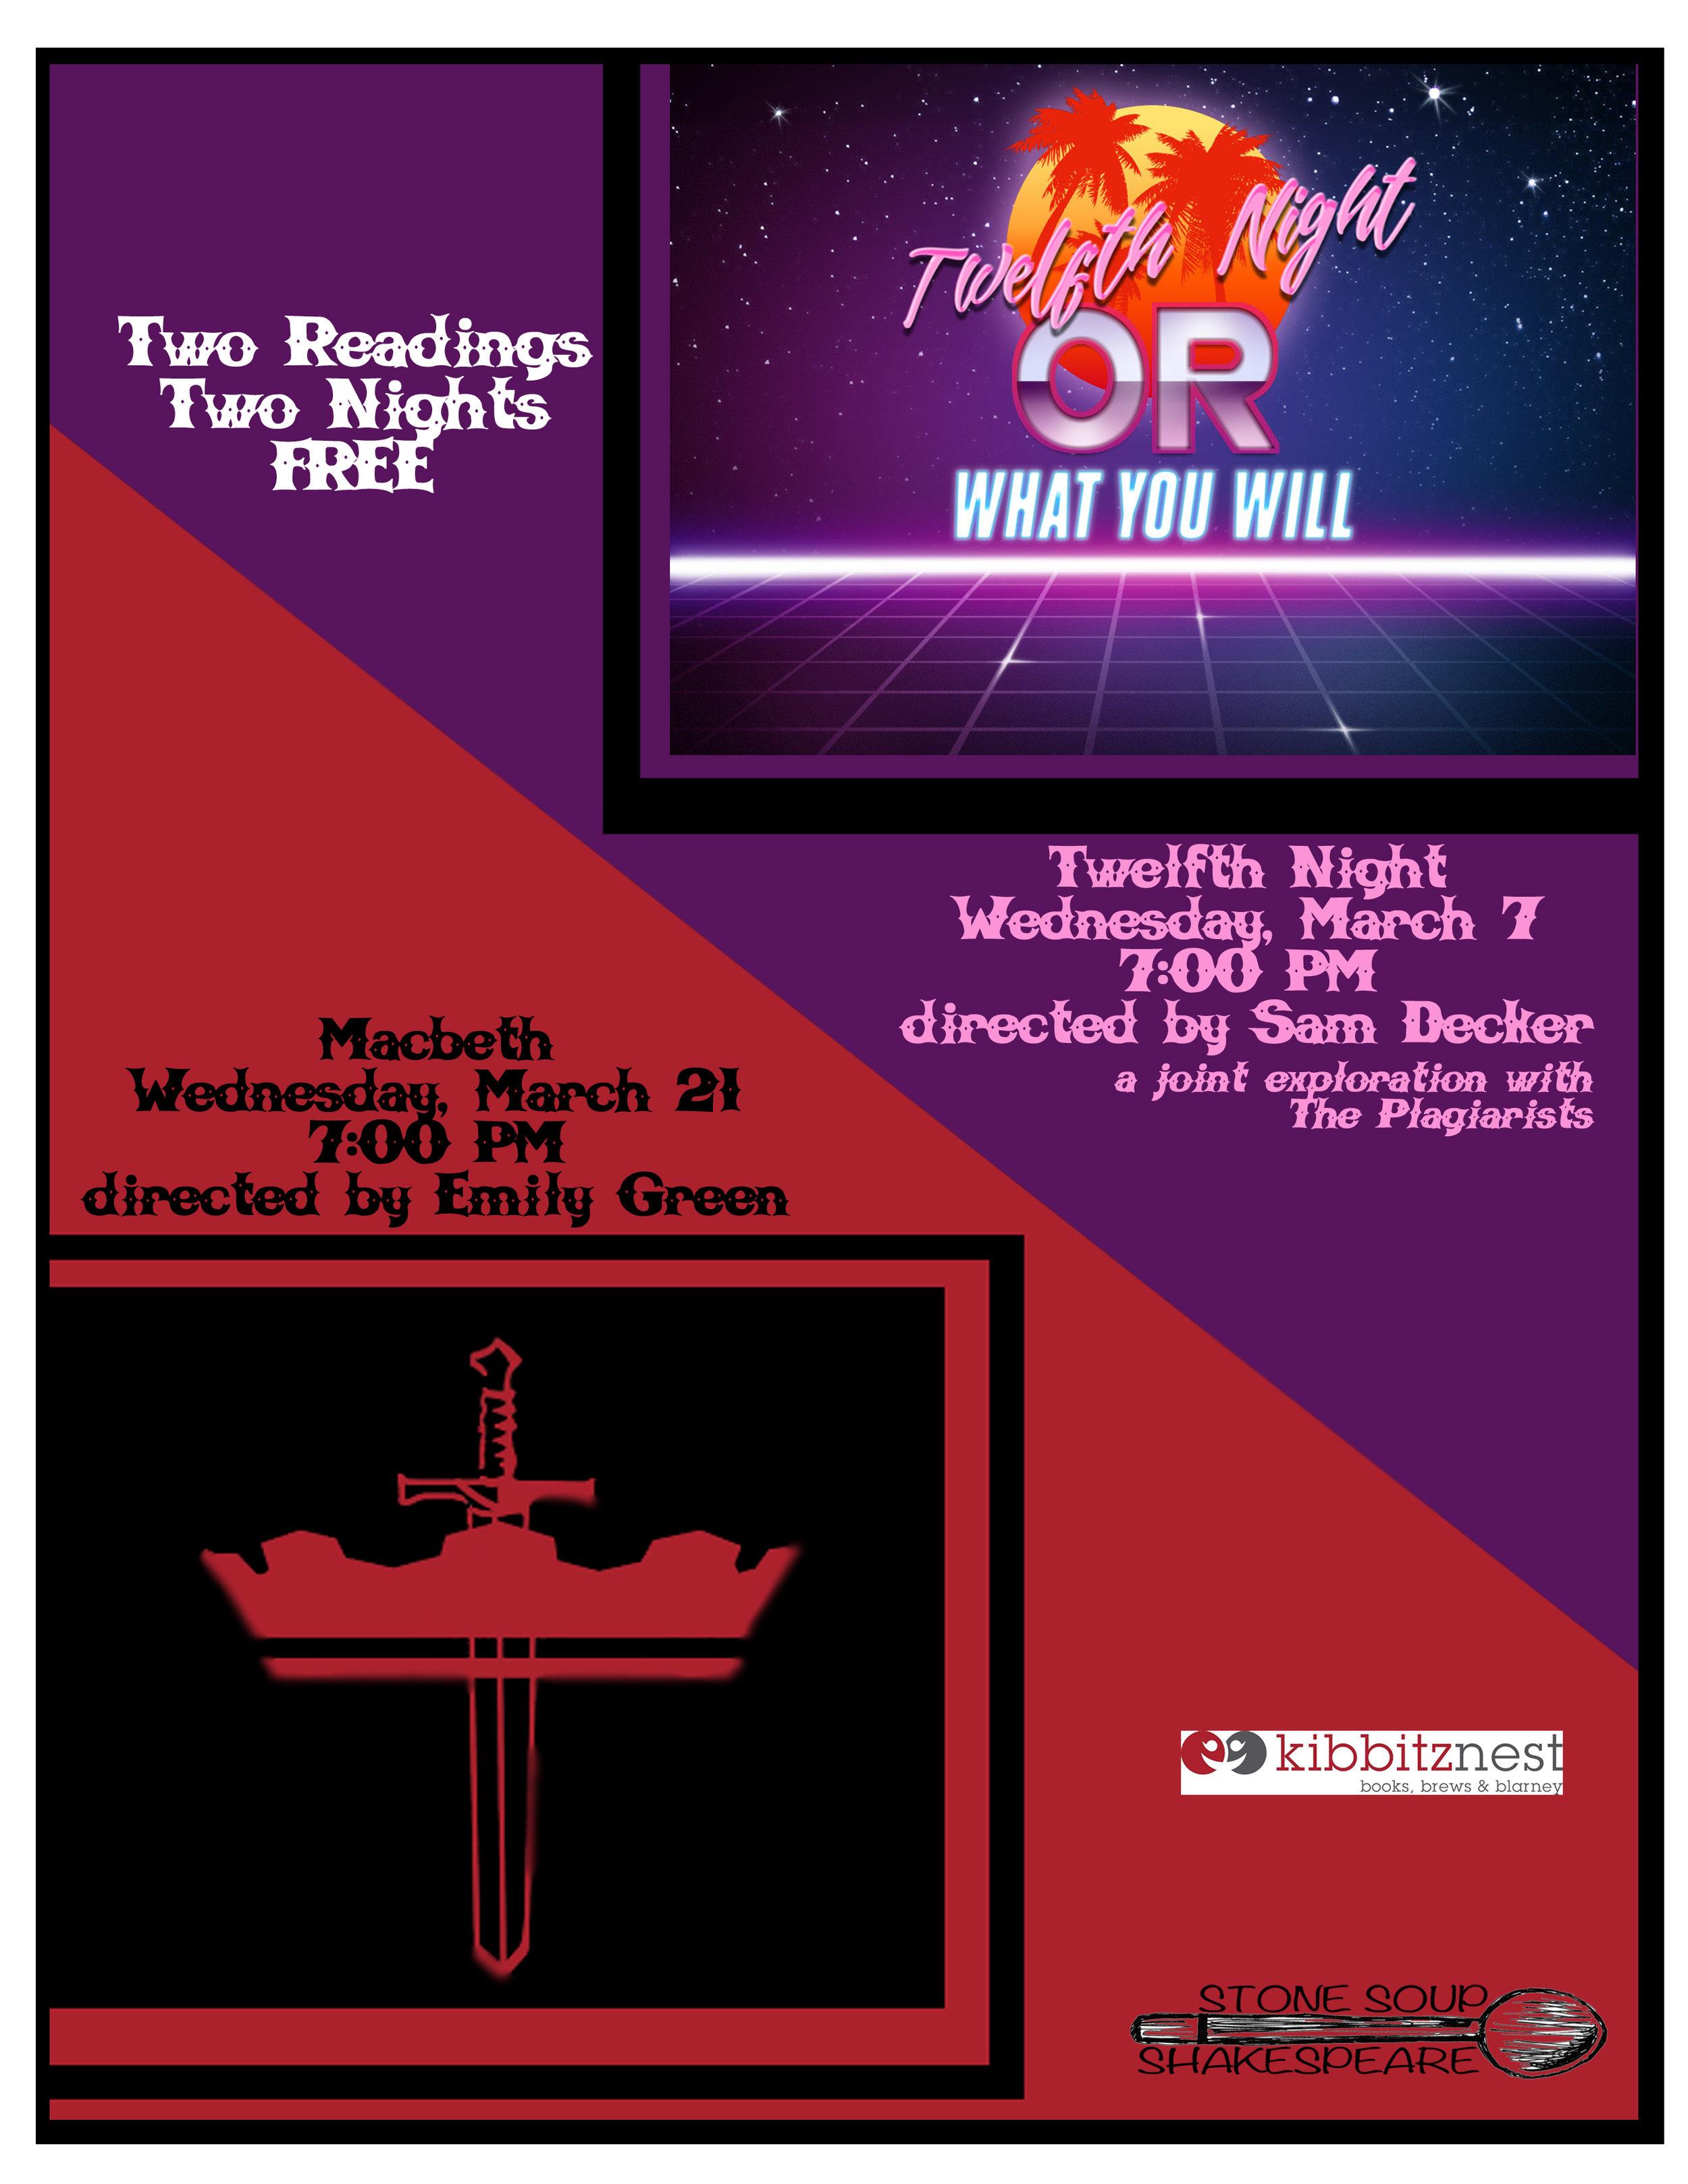 Twelfth Night - Directed bySam Decker